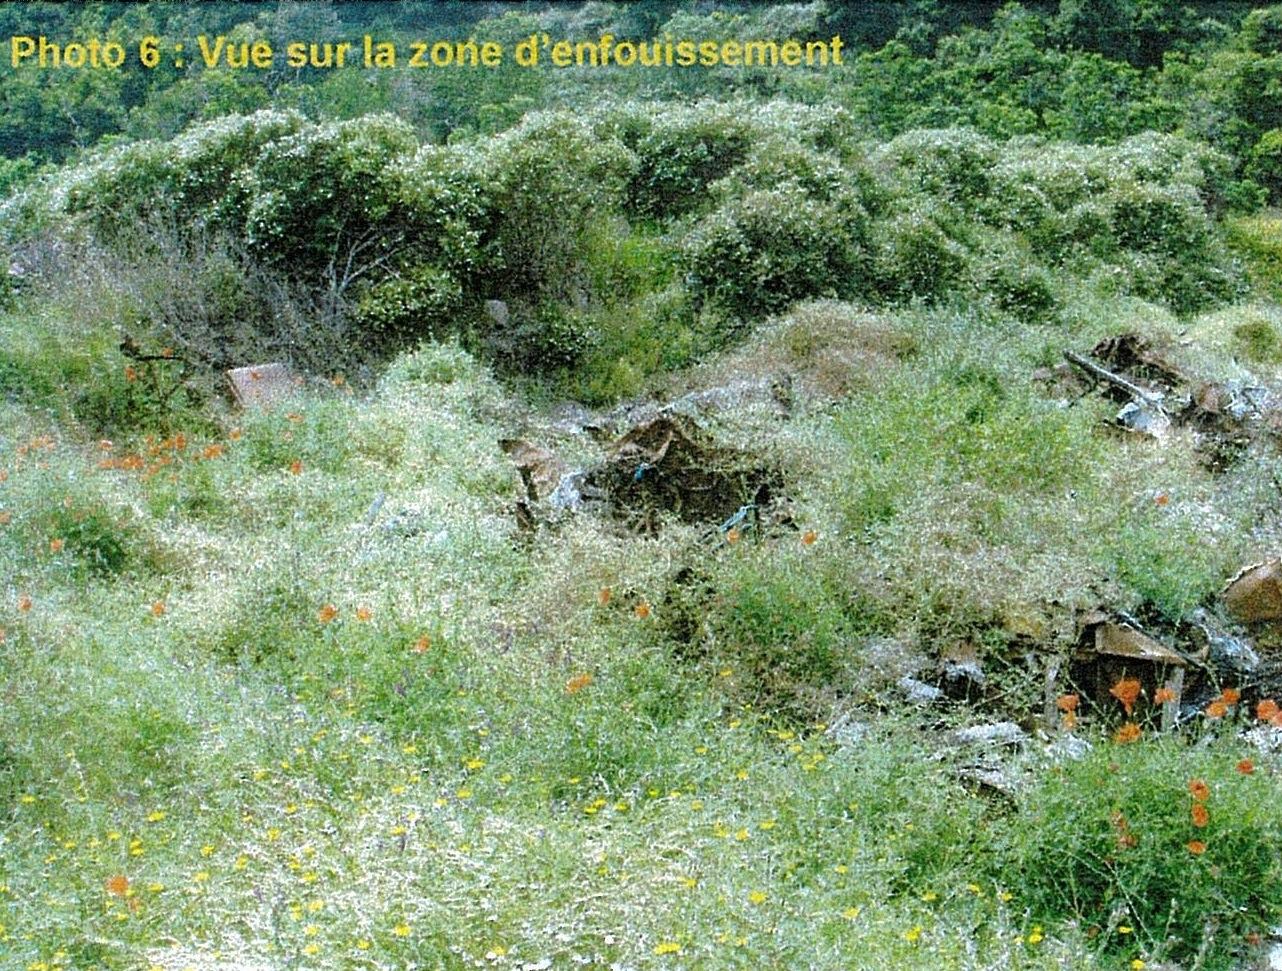 sari-dorcino-photo6-RobindesBois